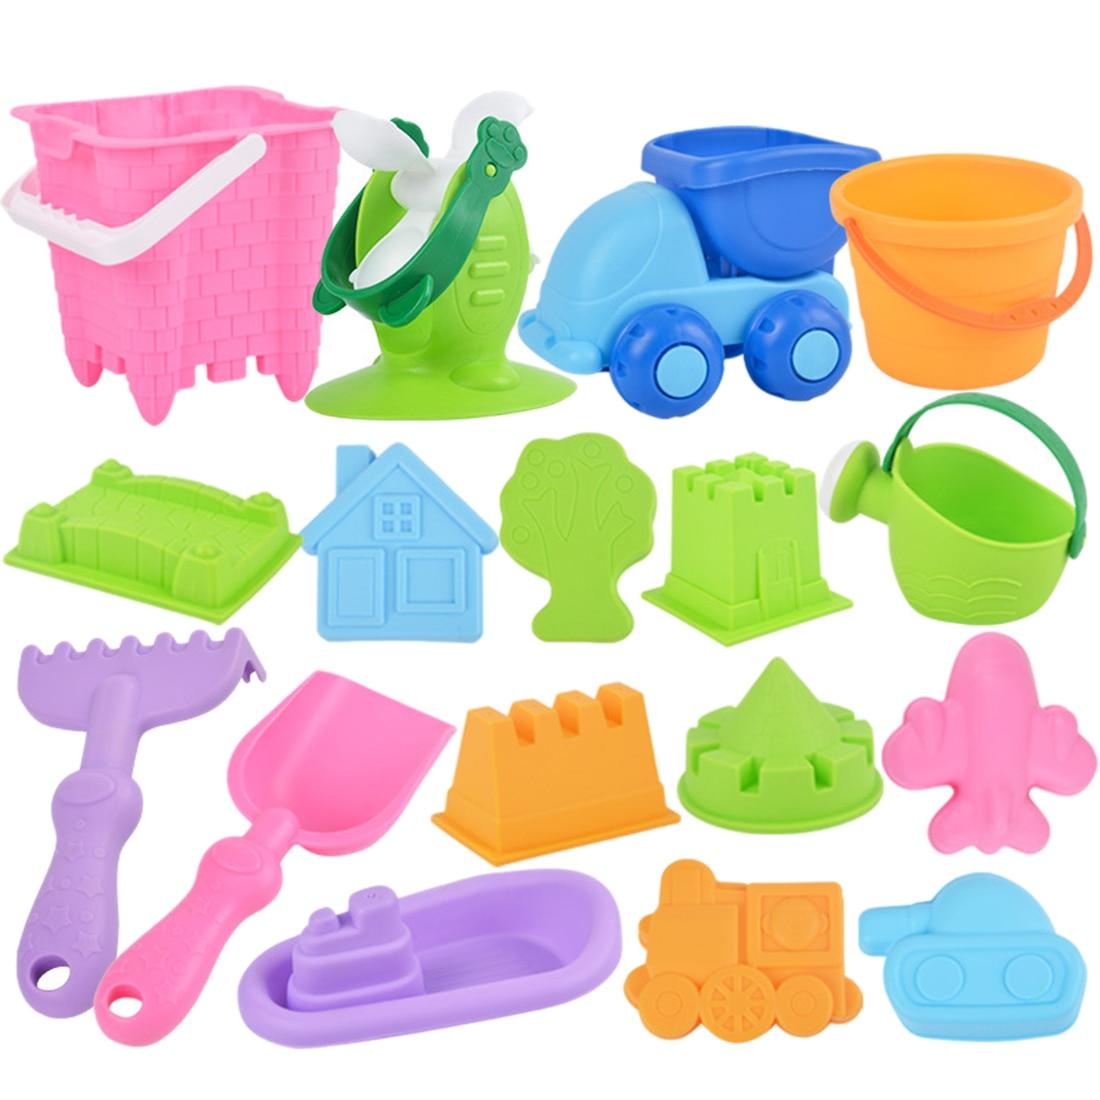 17Pcs/set Soft Plastic Beach Sand Toys Sand Water Playset Seaside Bucket Shovel Sand Set For Children Drop Ship - Color Random